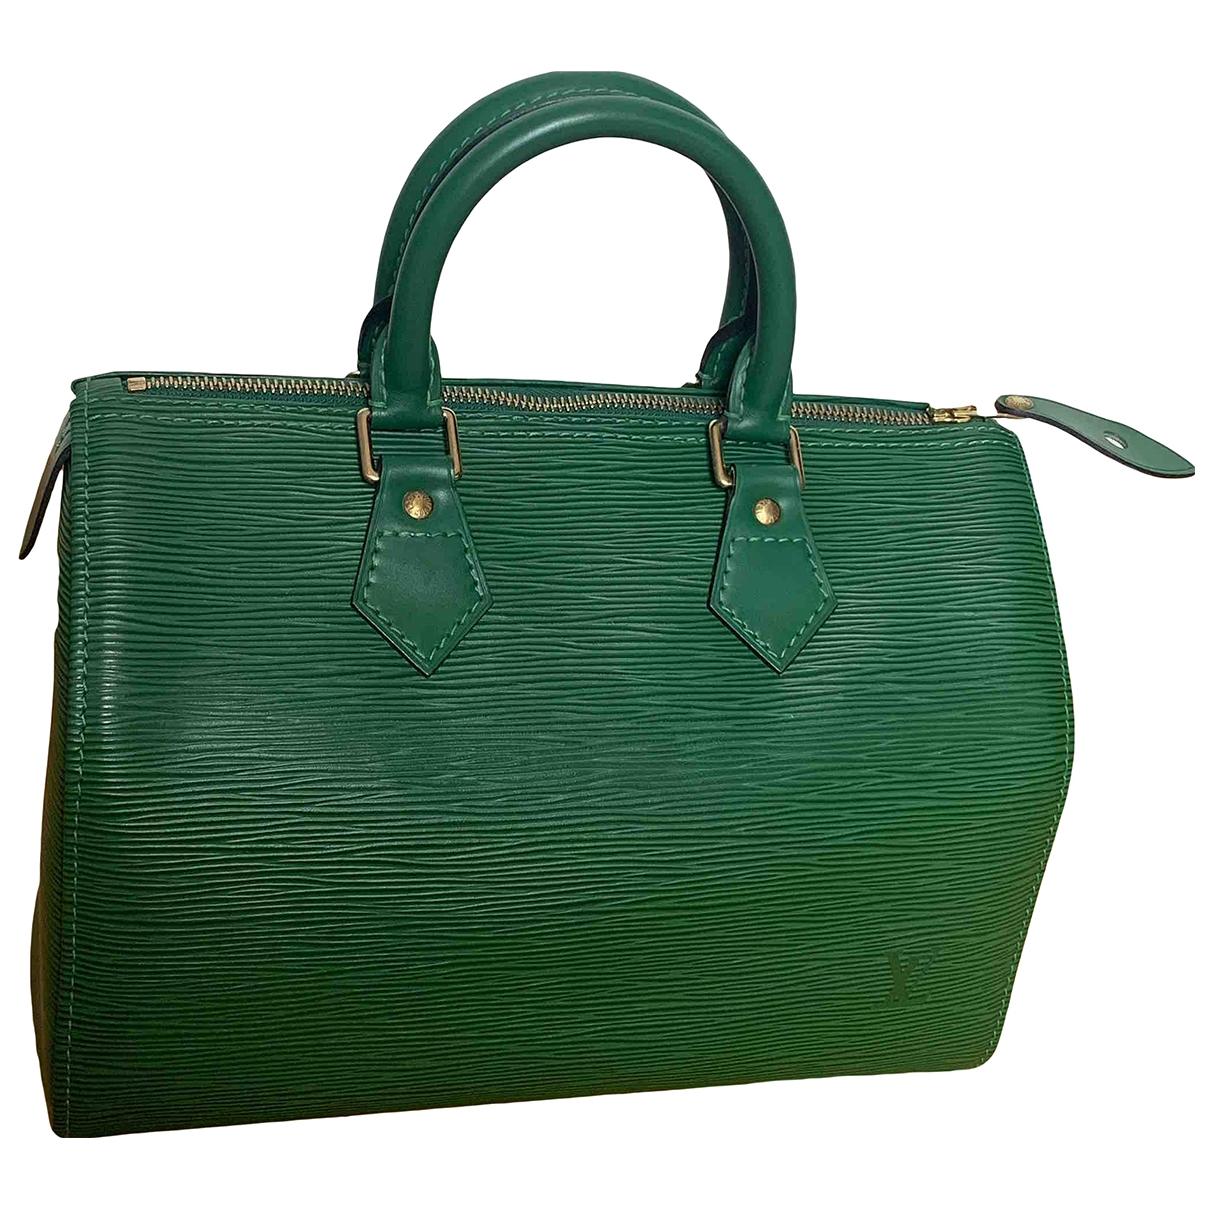 Louis Vuitton - Sac a main Speedy pour femme en cuir - vert